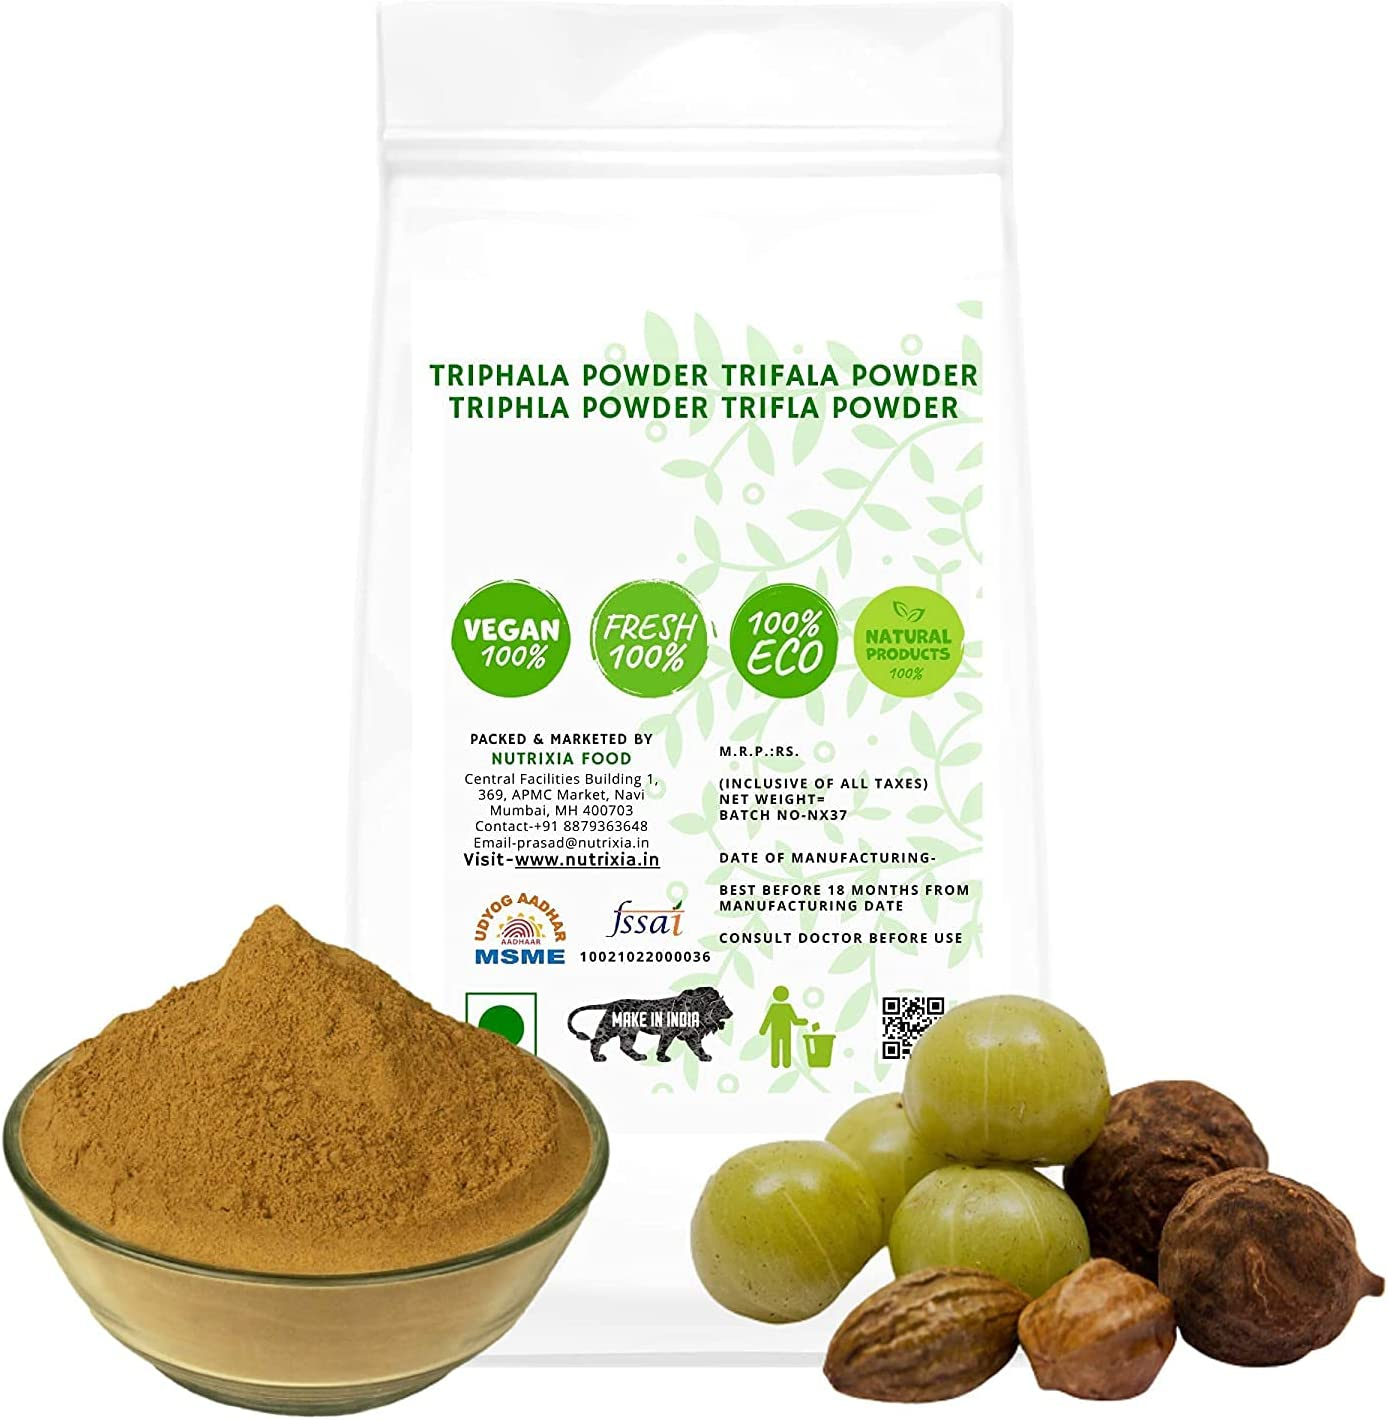 Trisha Branded goods TRIPHALA Powder TRIFALA TRIFLA TRIPHLA Powd At the price